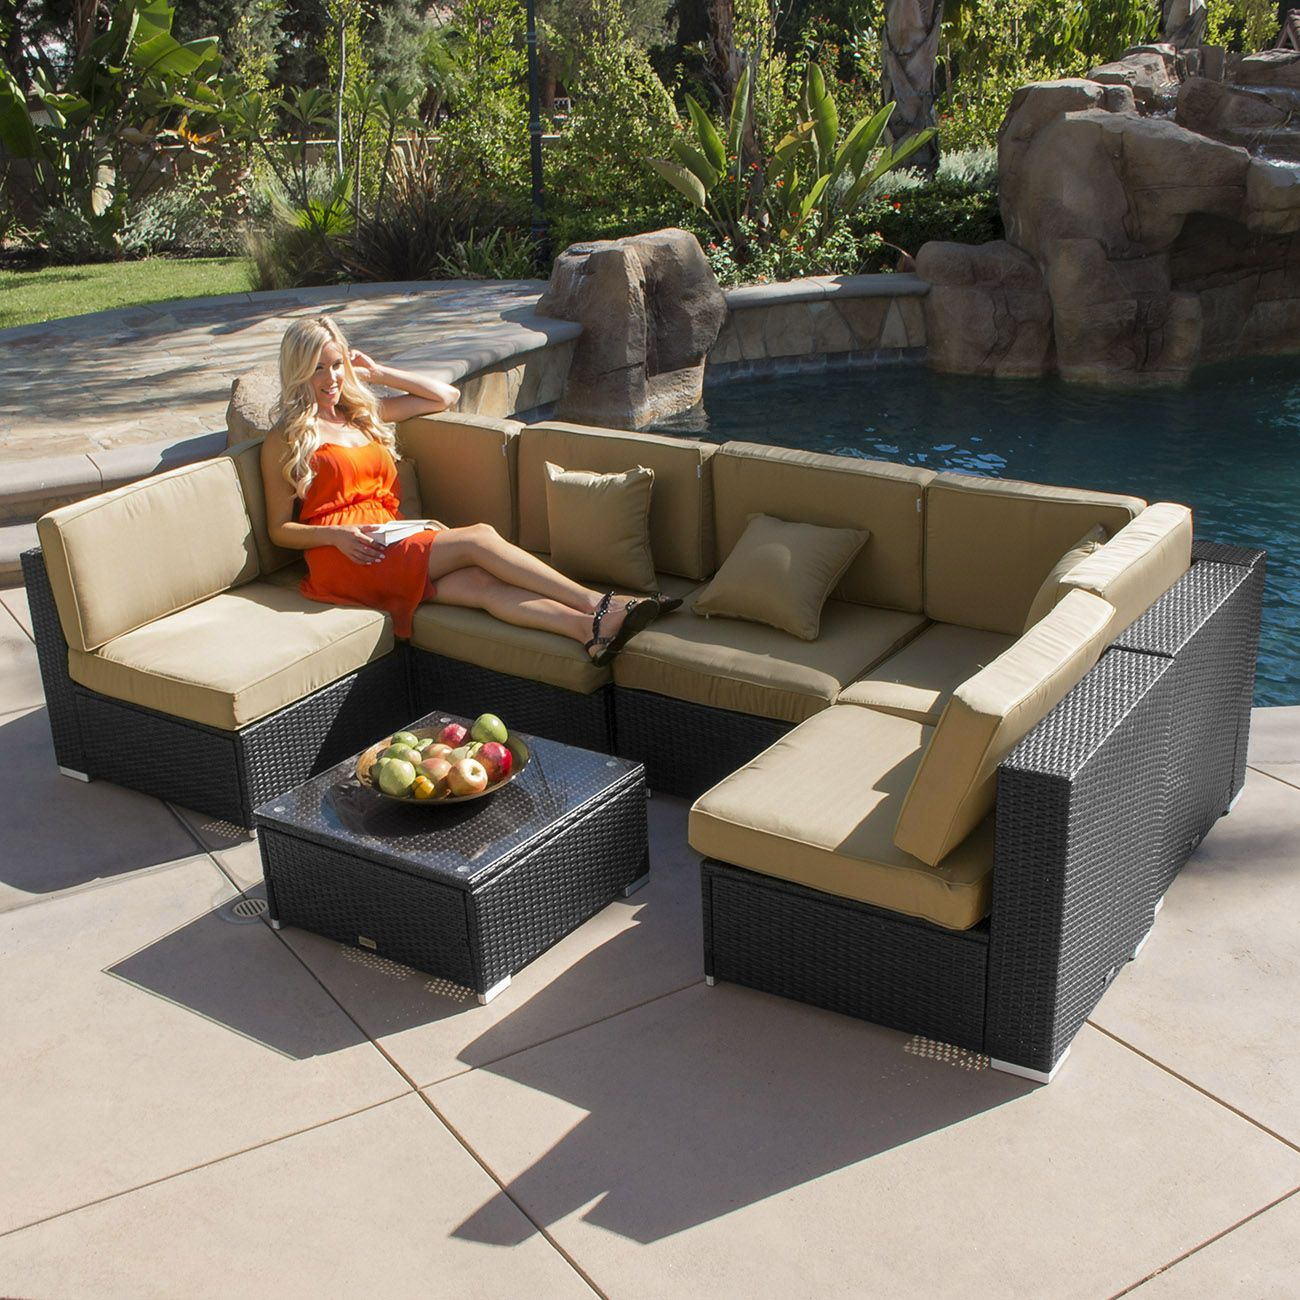 7pc Outdoor Patio Rattan Wicker Furniture Aluminum Sectional Sofa